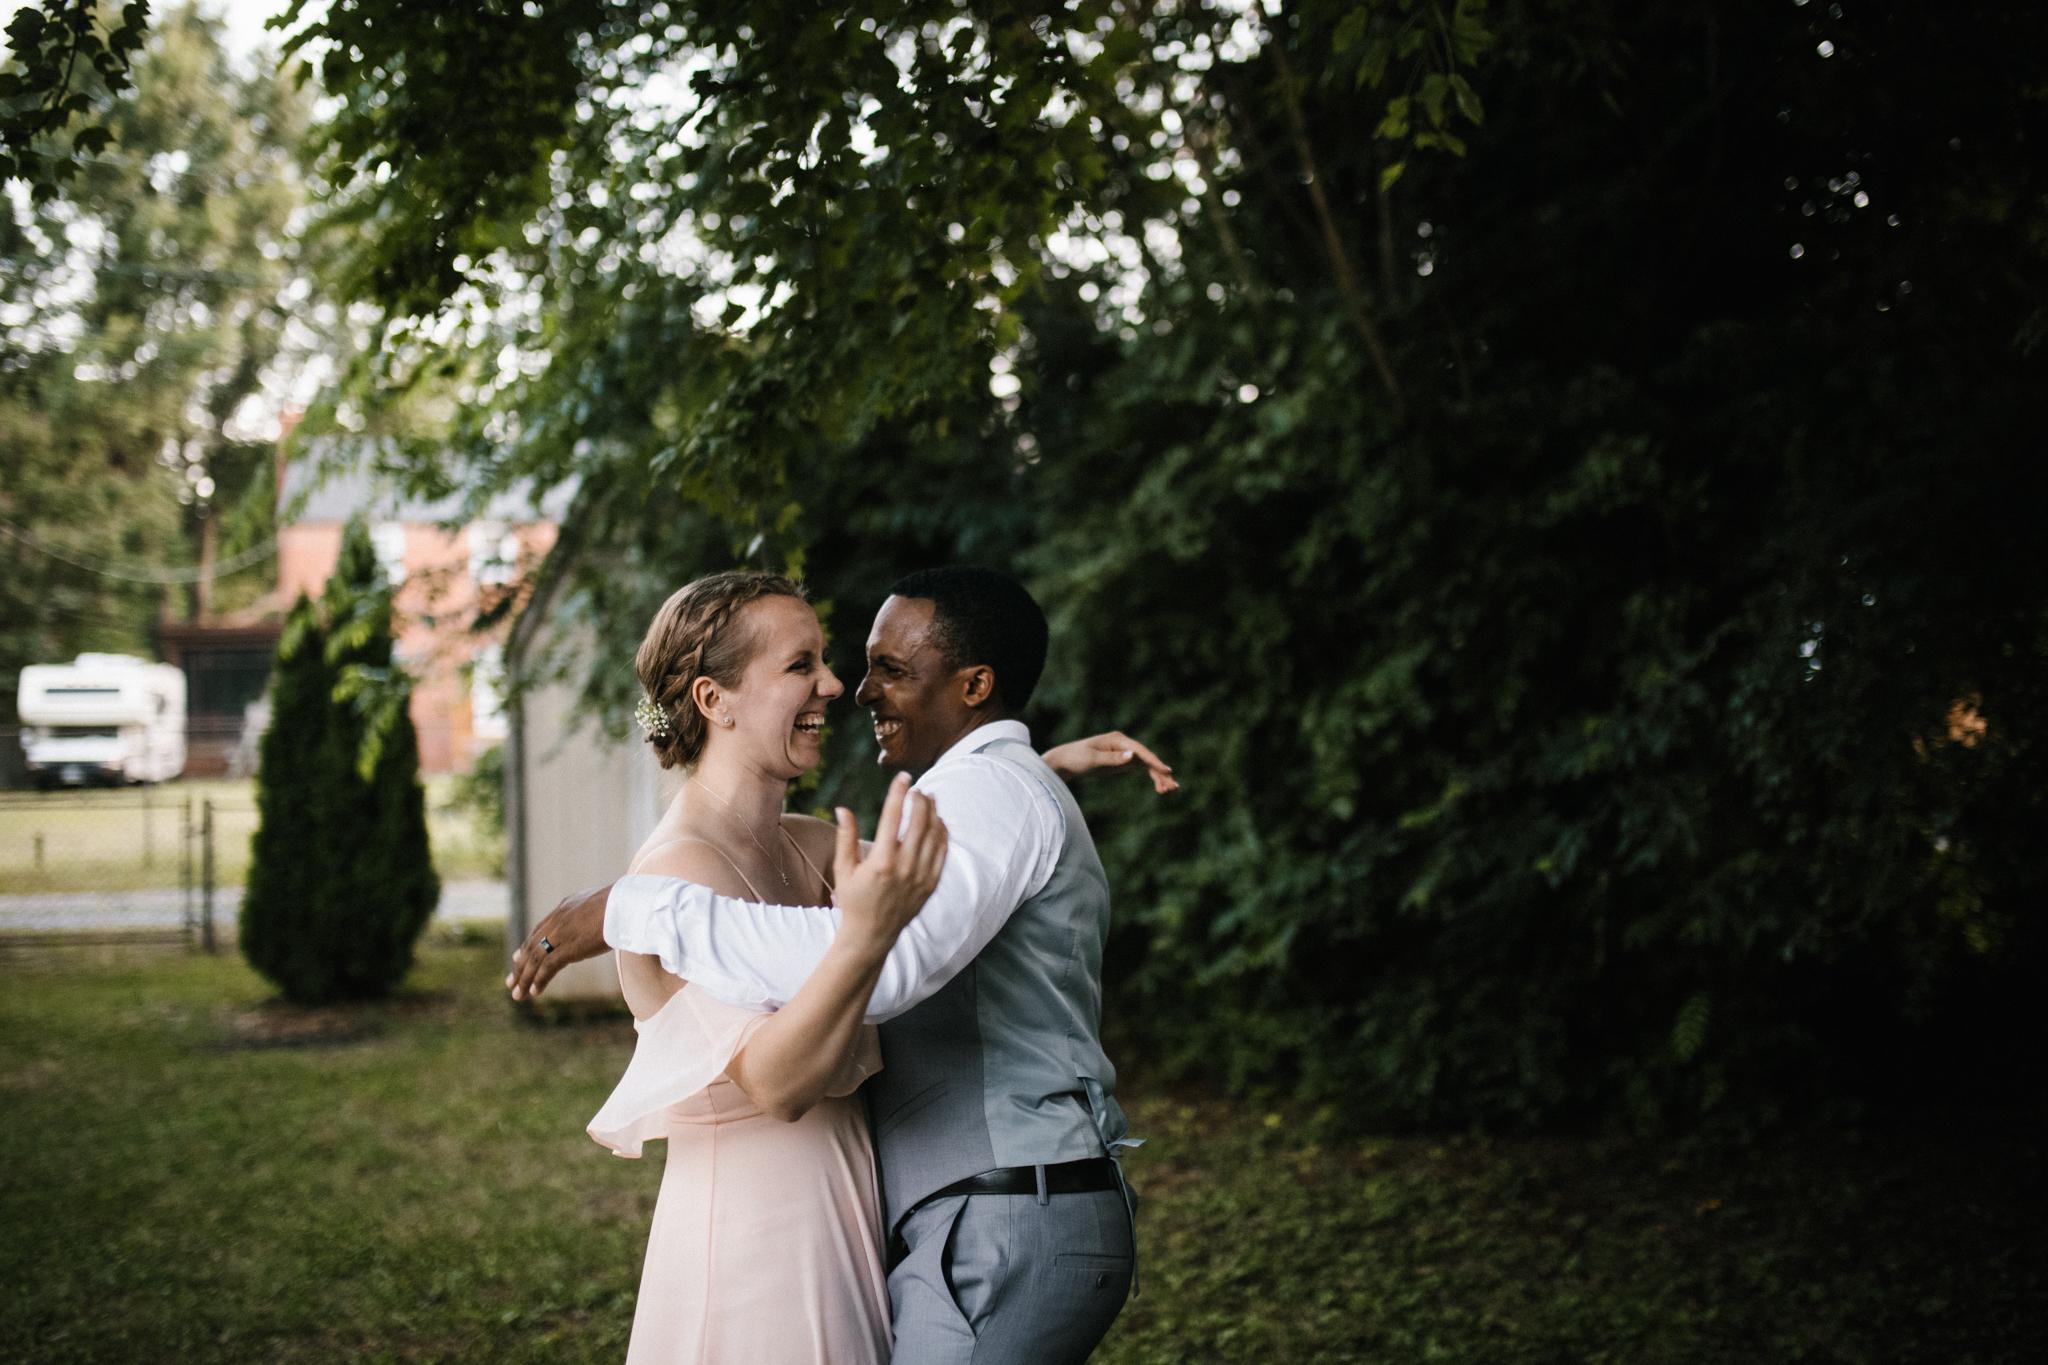 dorota_dwight_richmond_backyard_wedding-97.jpg